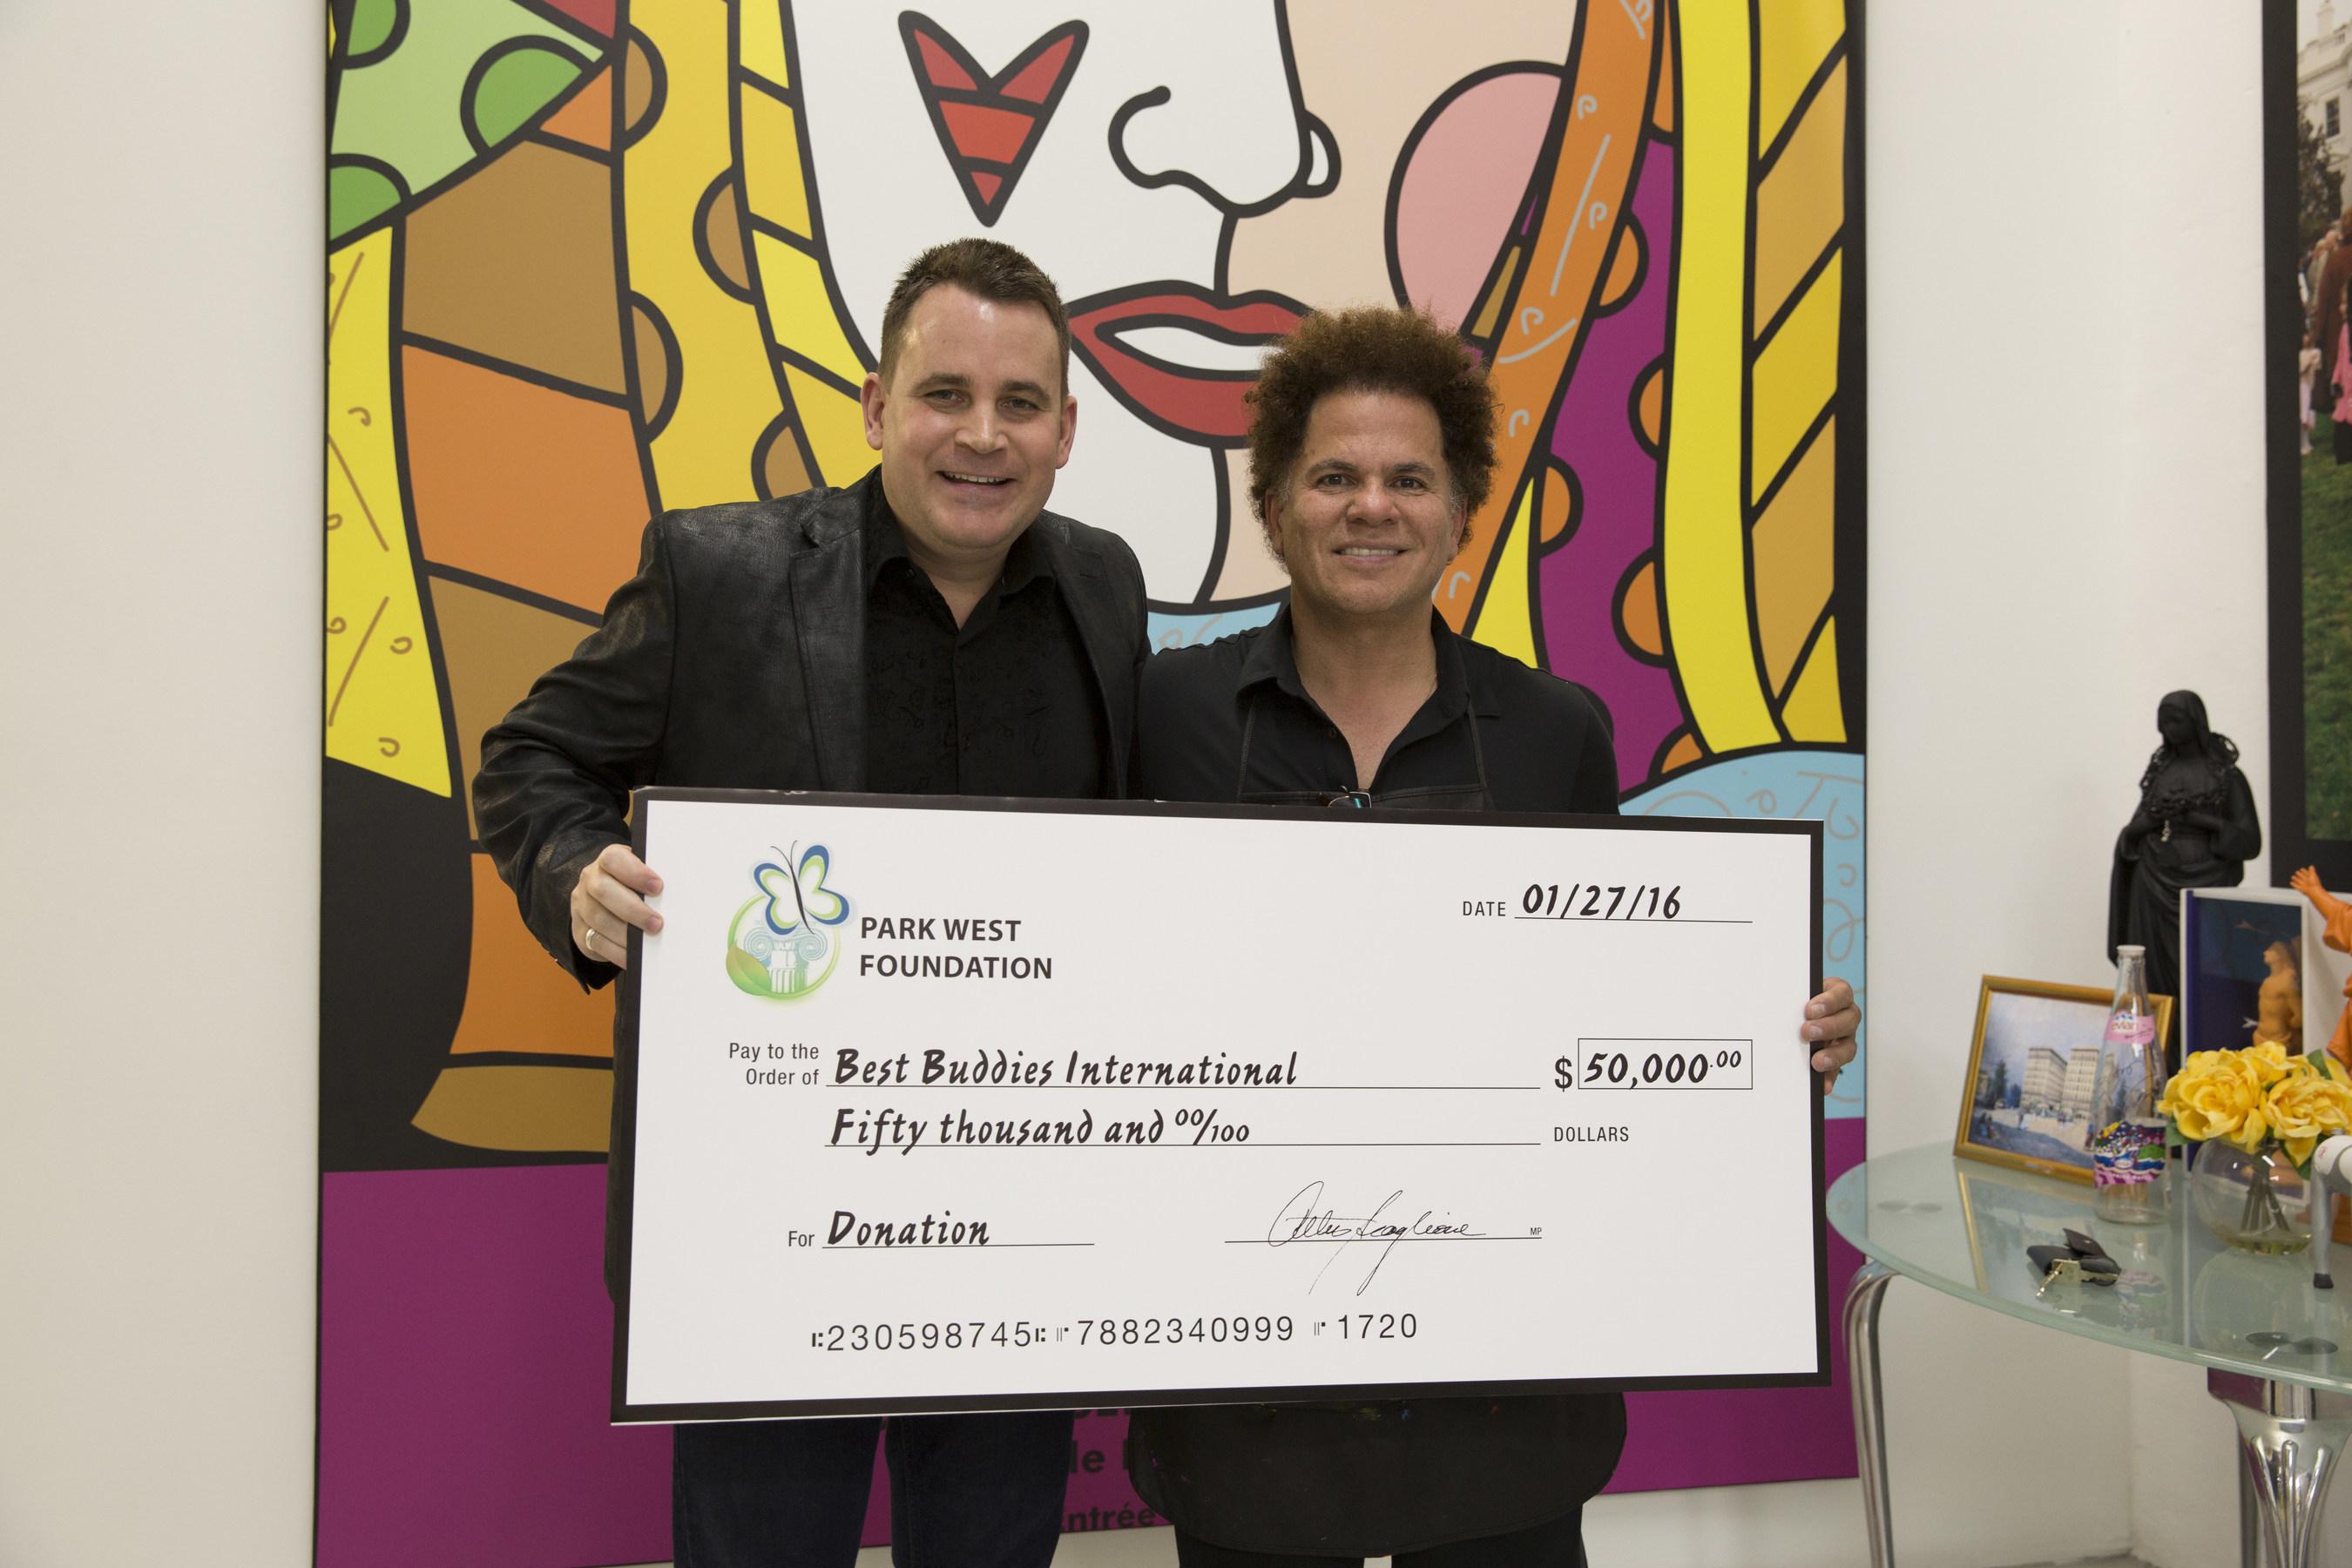 Park West Gallery VIP Art Director Jason Betteridge presents a $50,000 check to Romero Britto that will benefit Best Buddies International. (Credit: Park West Gallery)